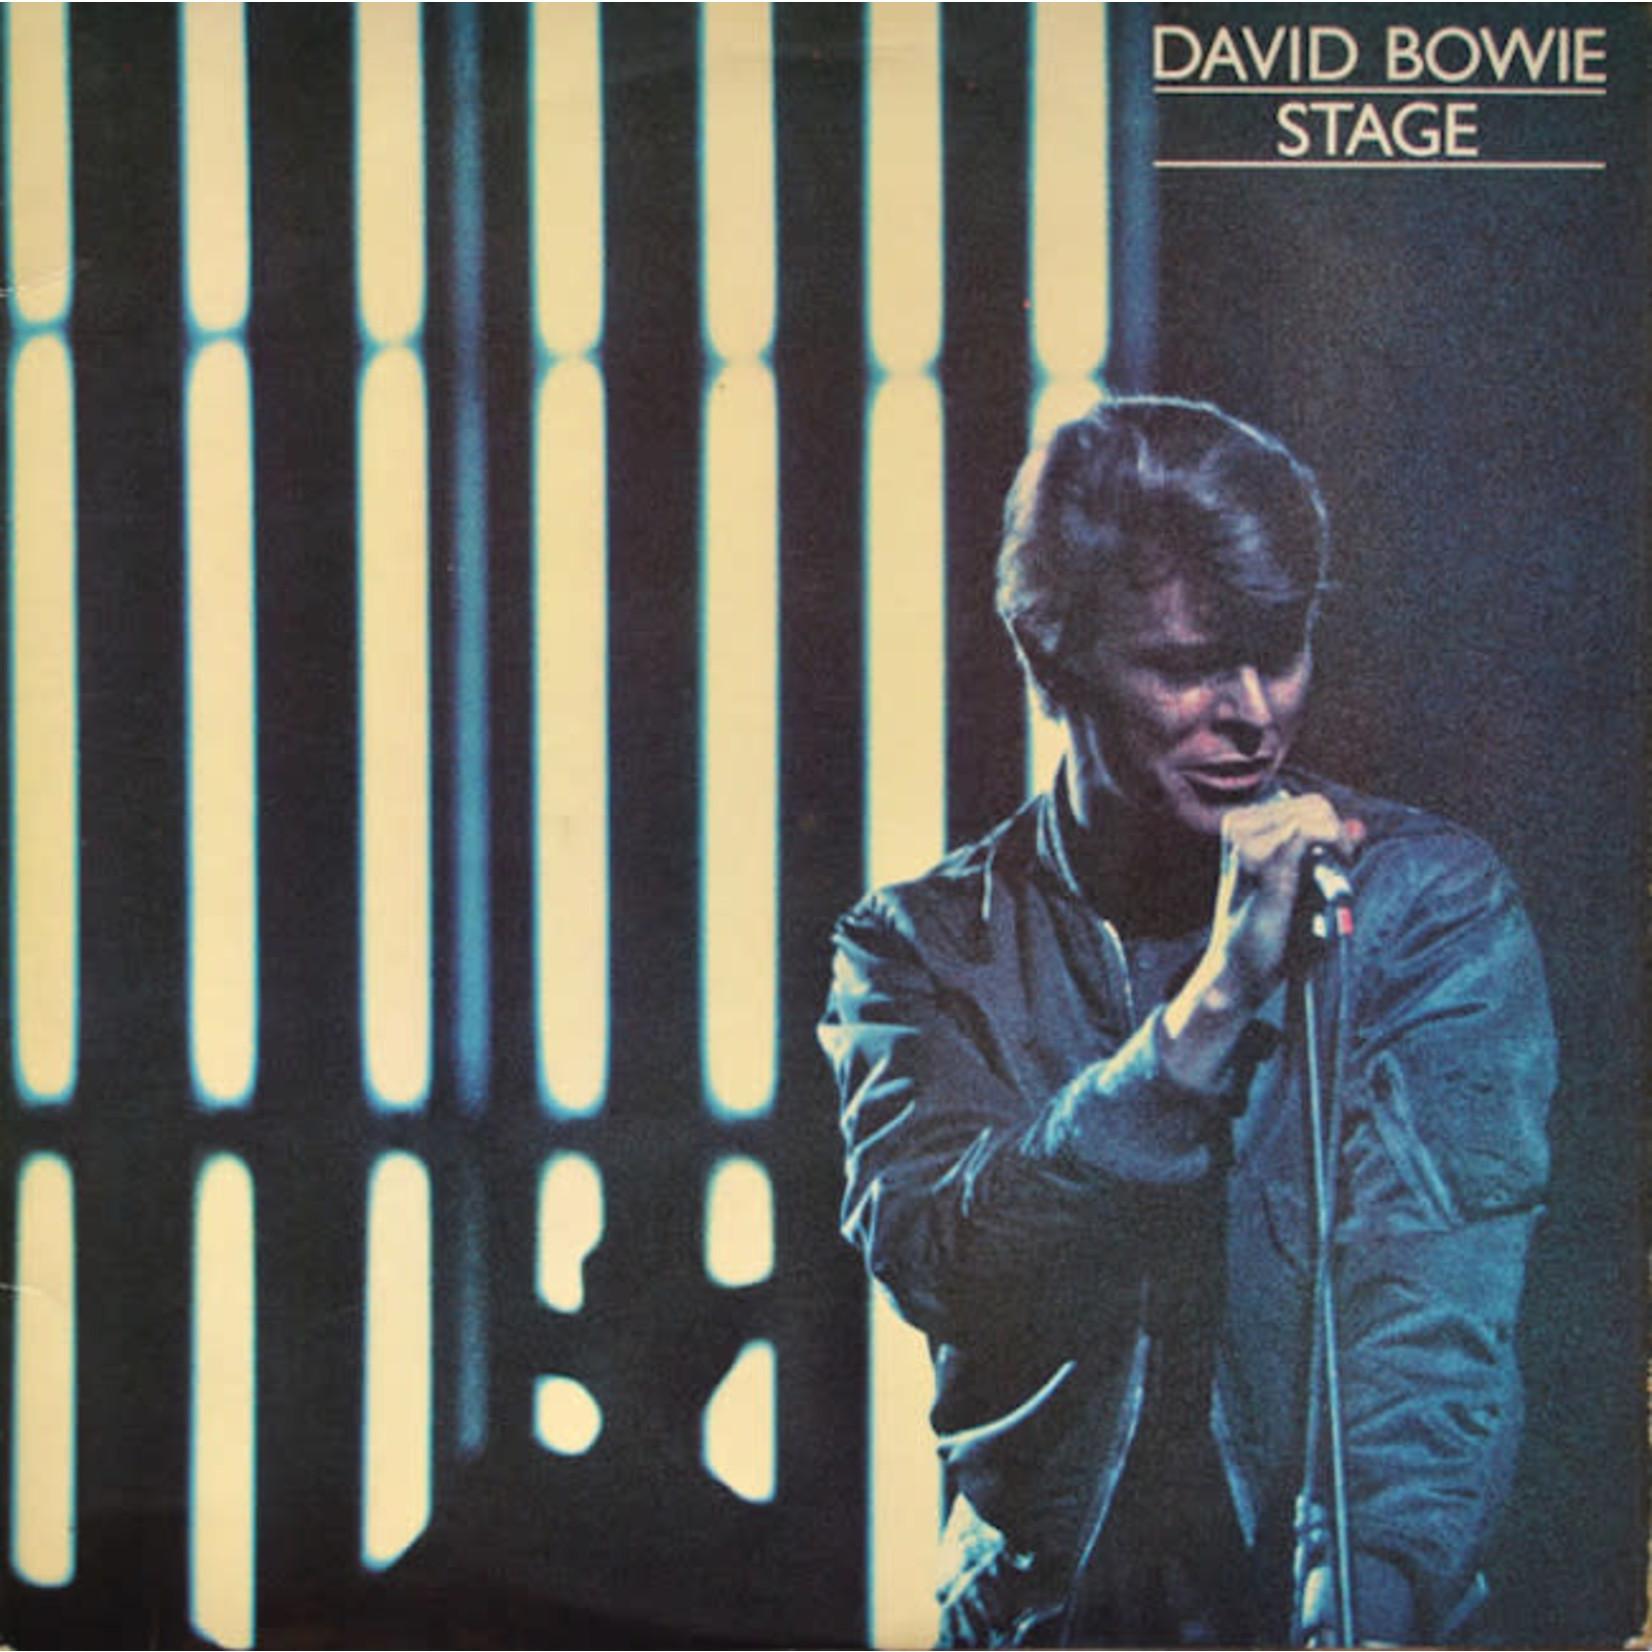 [Vintage] Bowie, David: Stage (2LP)